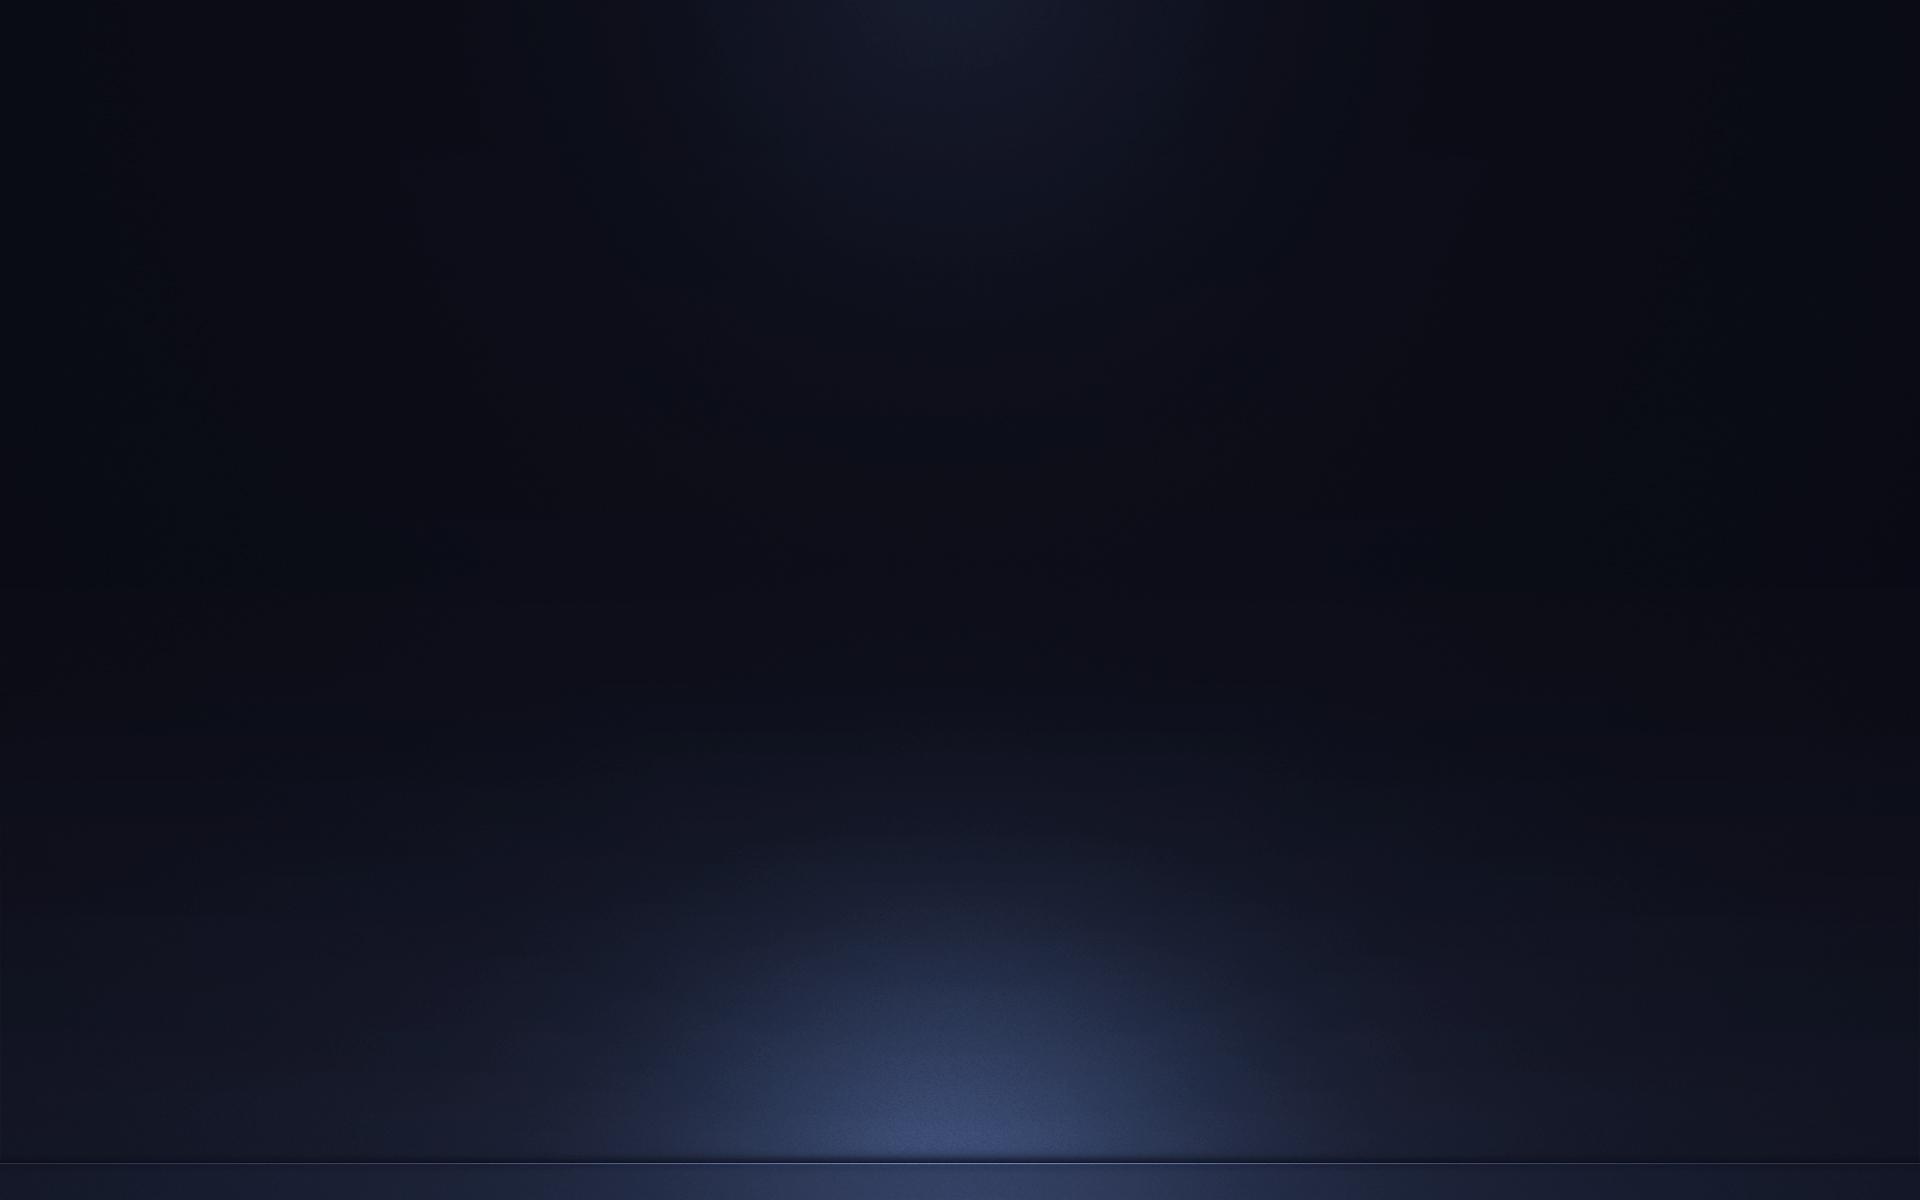 blue wallpapers desktop background 1920x1200 1920x1200